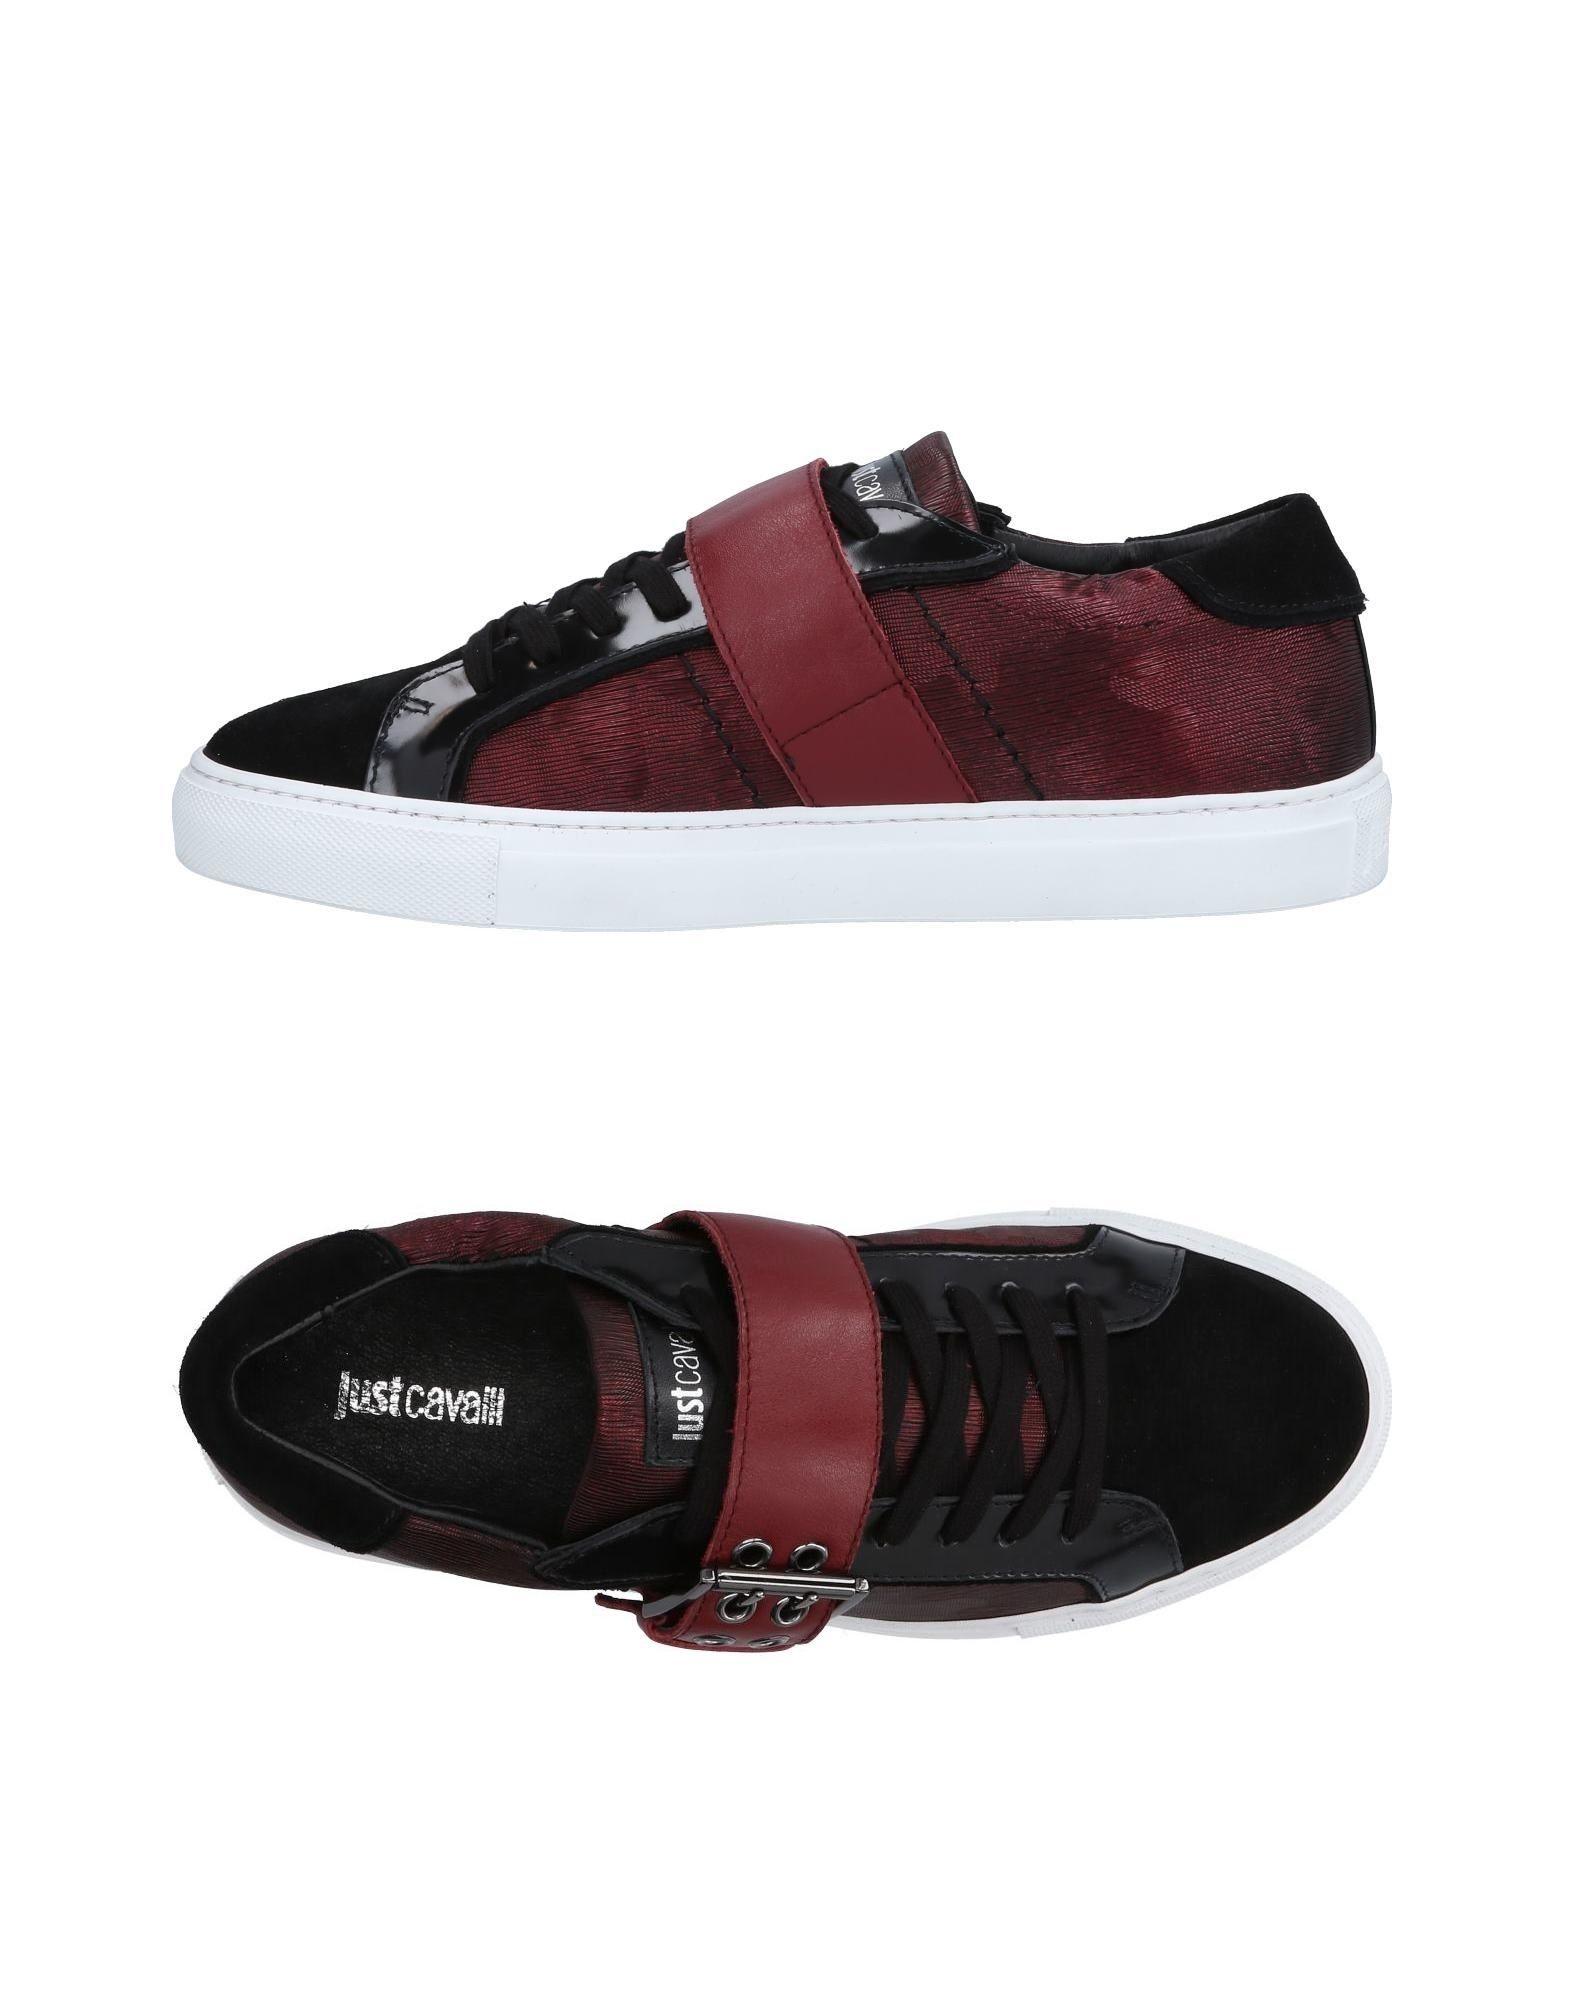 Just Cavalli Sneakers Herren  11498189SR Gute Qualität beliebte Schuhe